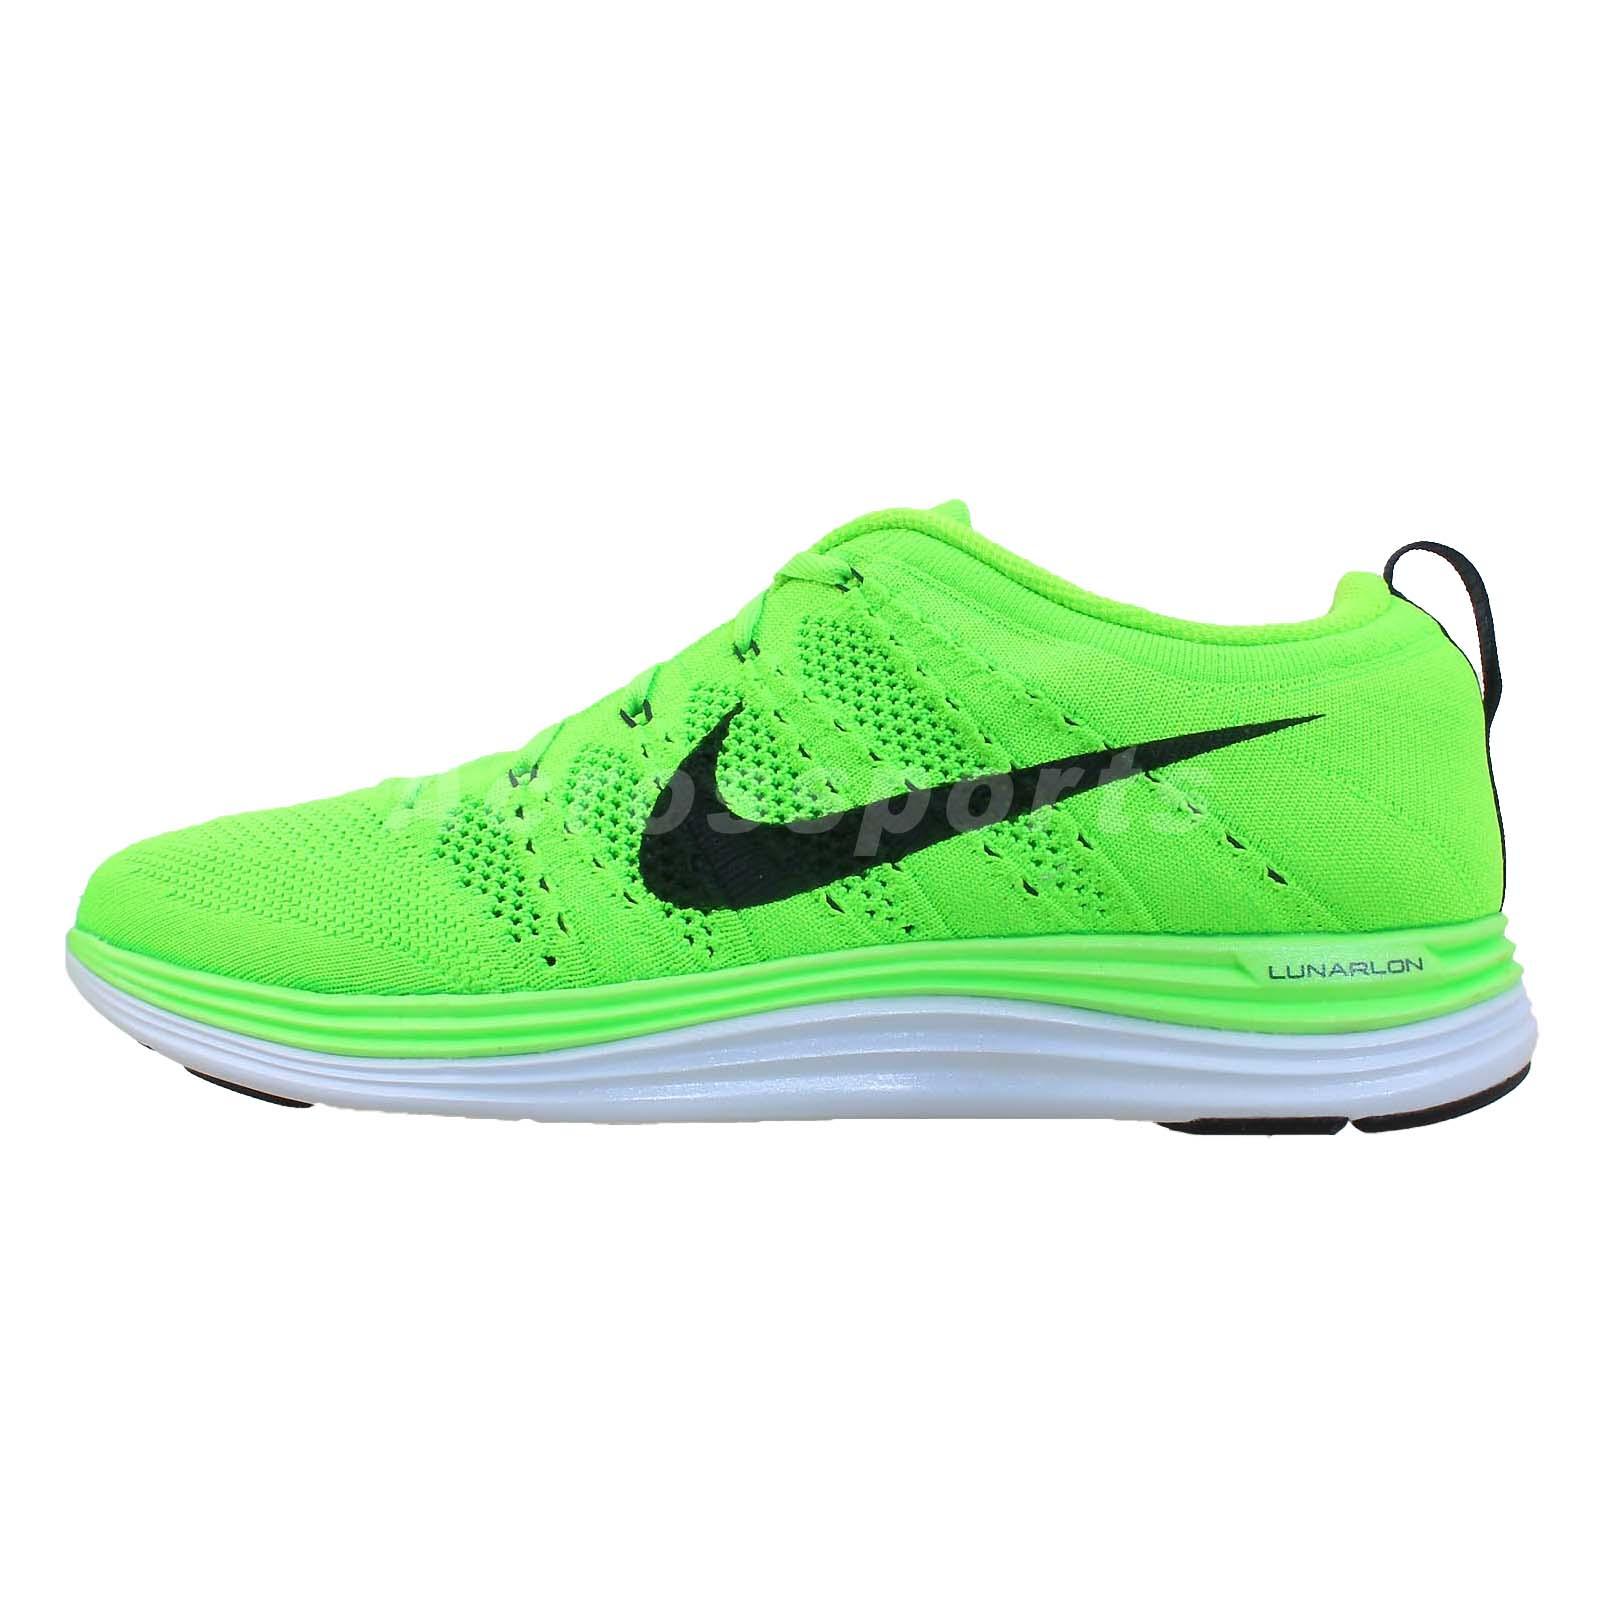 Nike Flyknit Lunar1 One 2013 Mens Running Shoes Runner ...